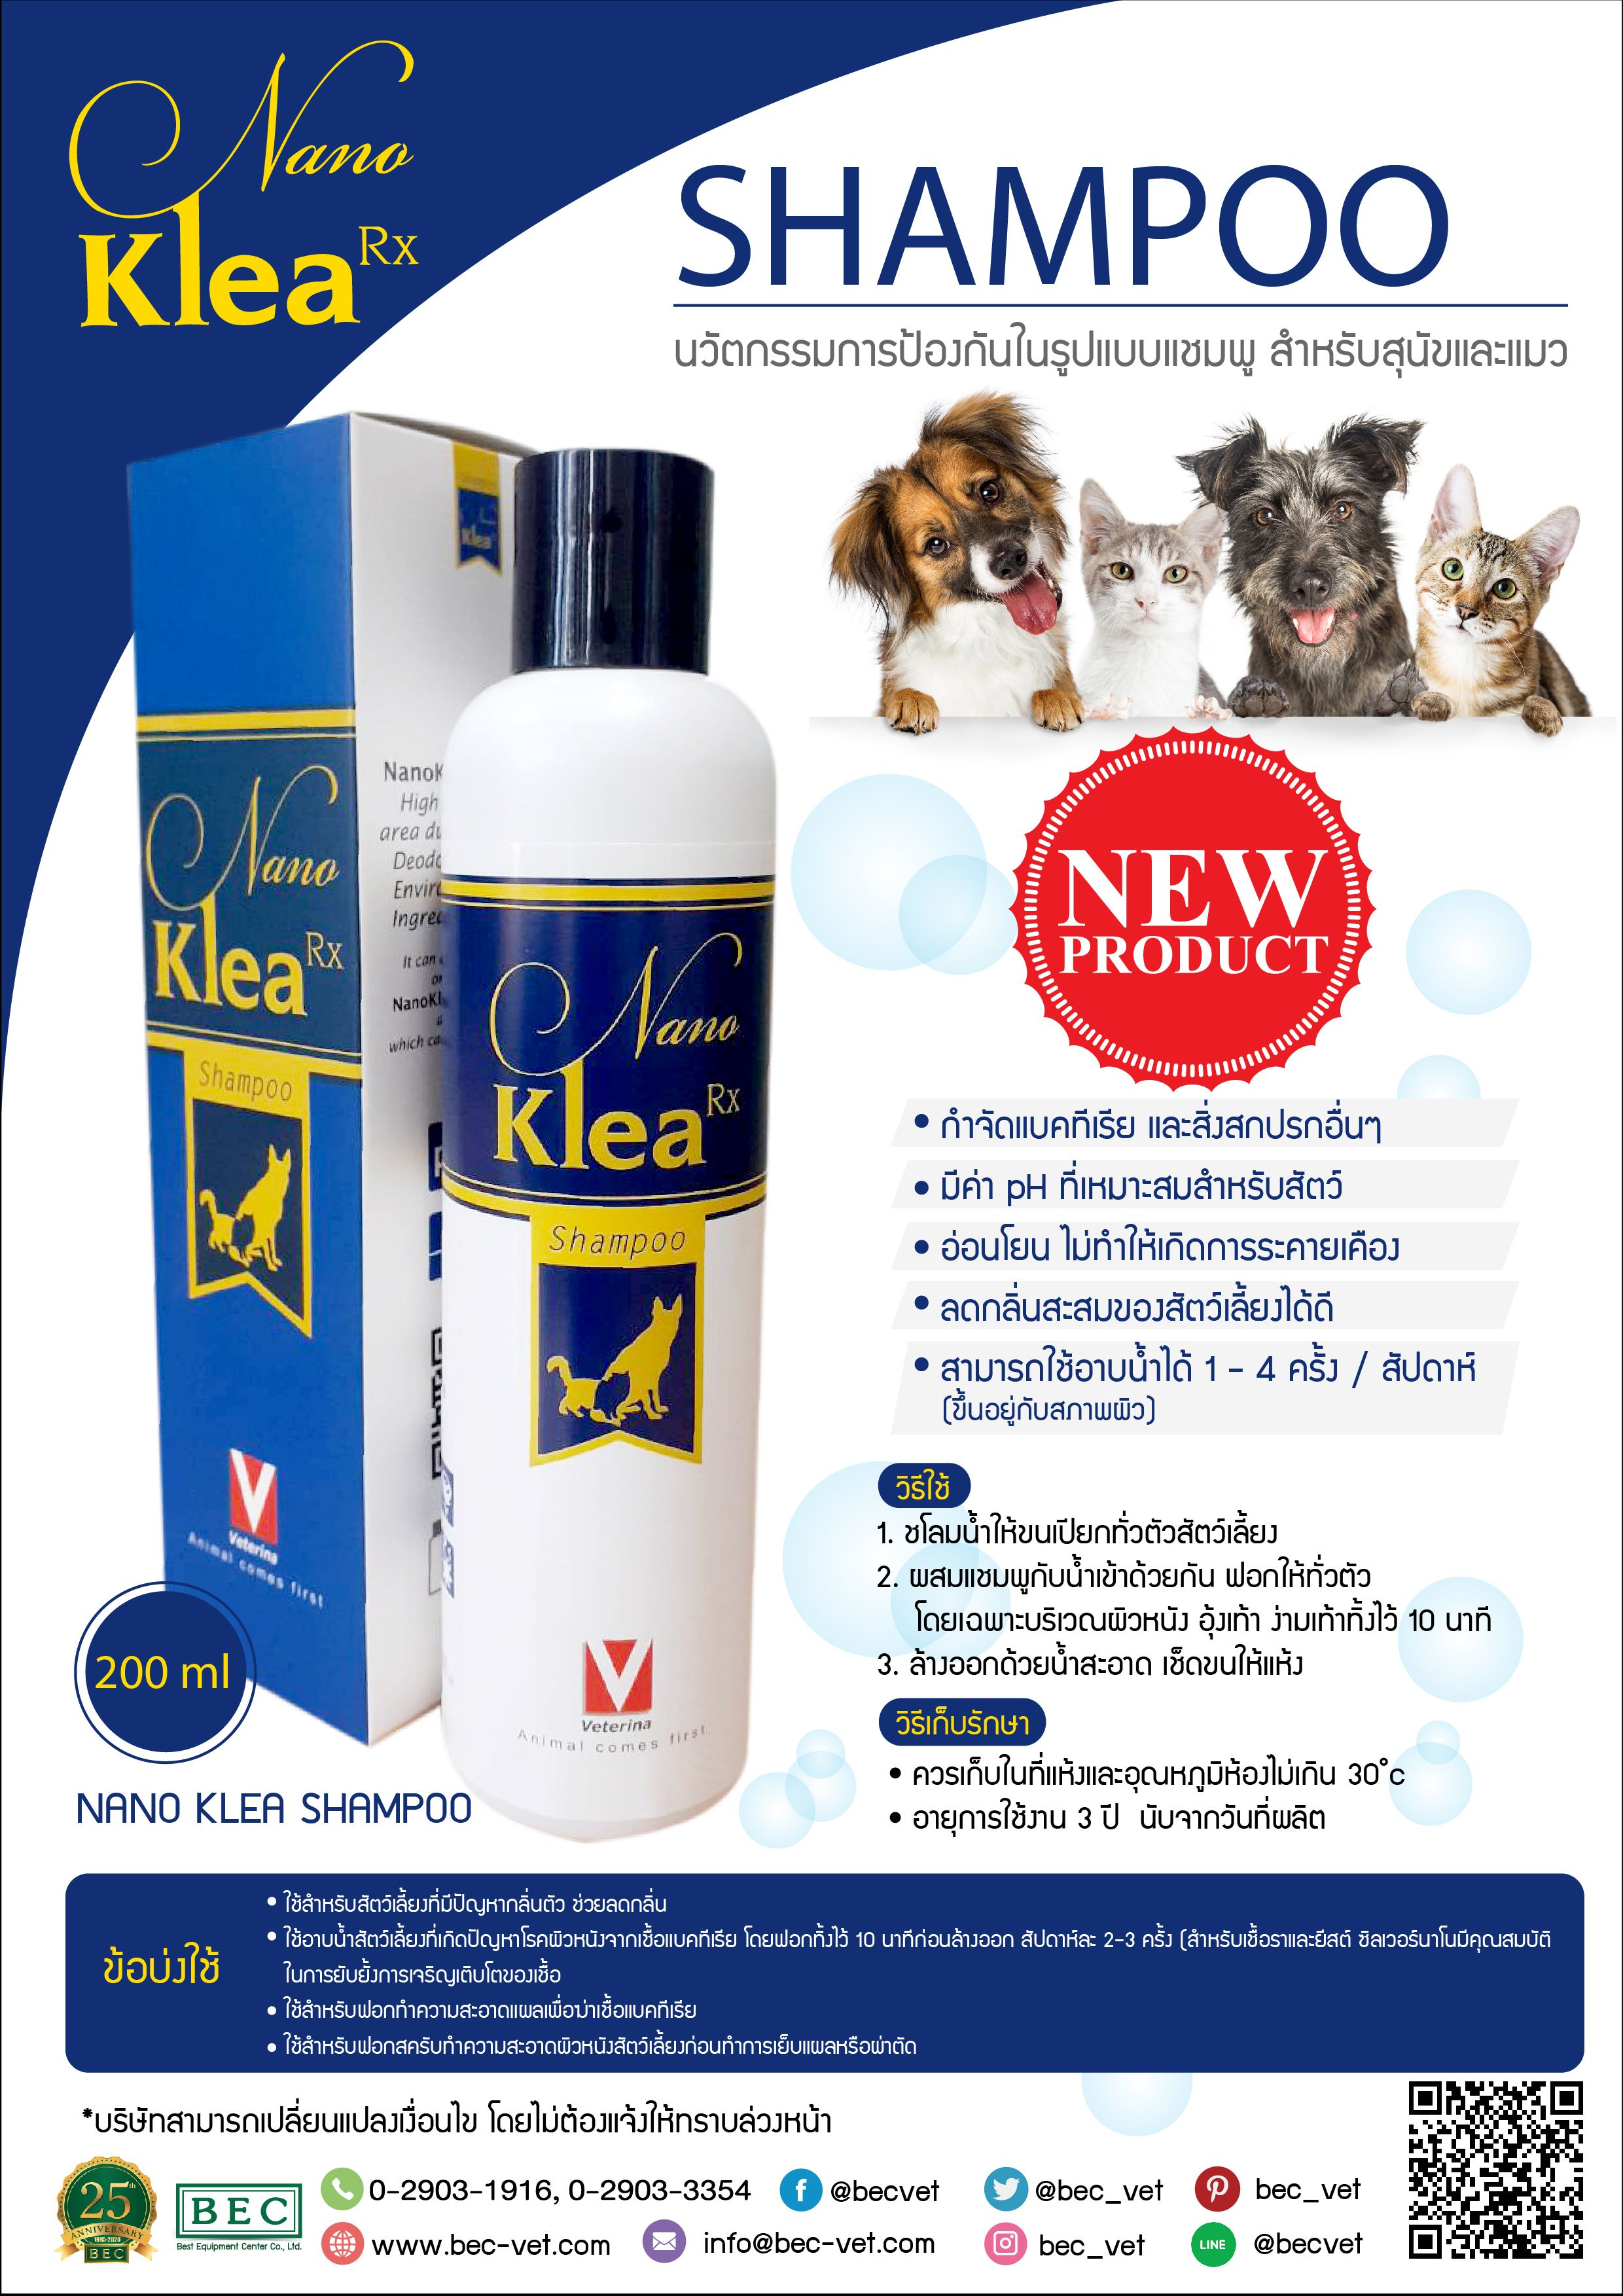 Nano Klea Shampoo